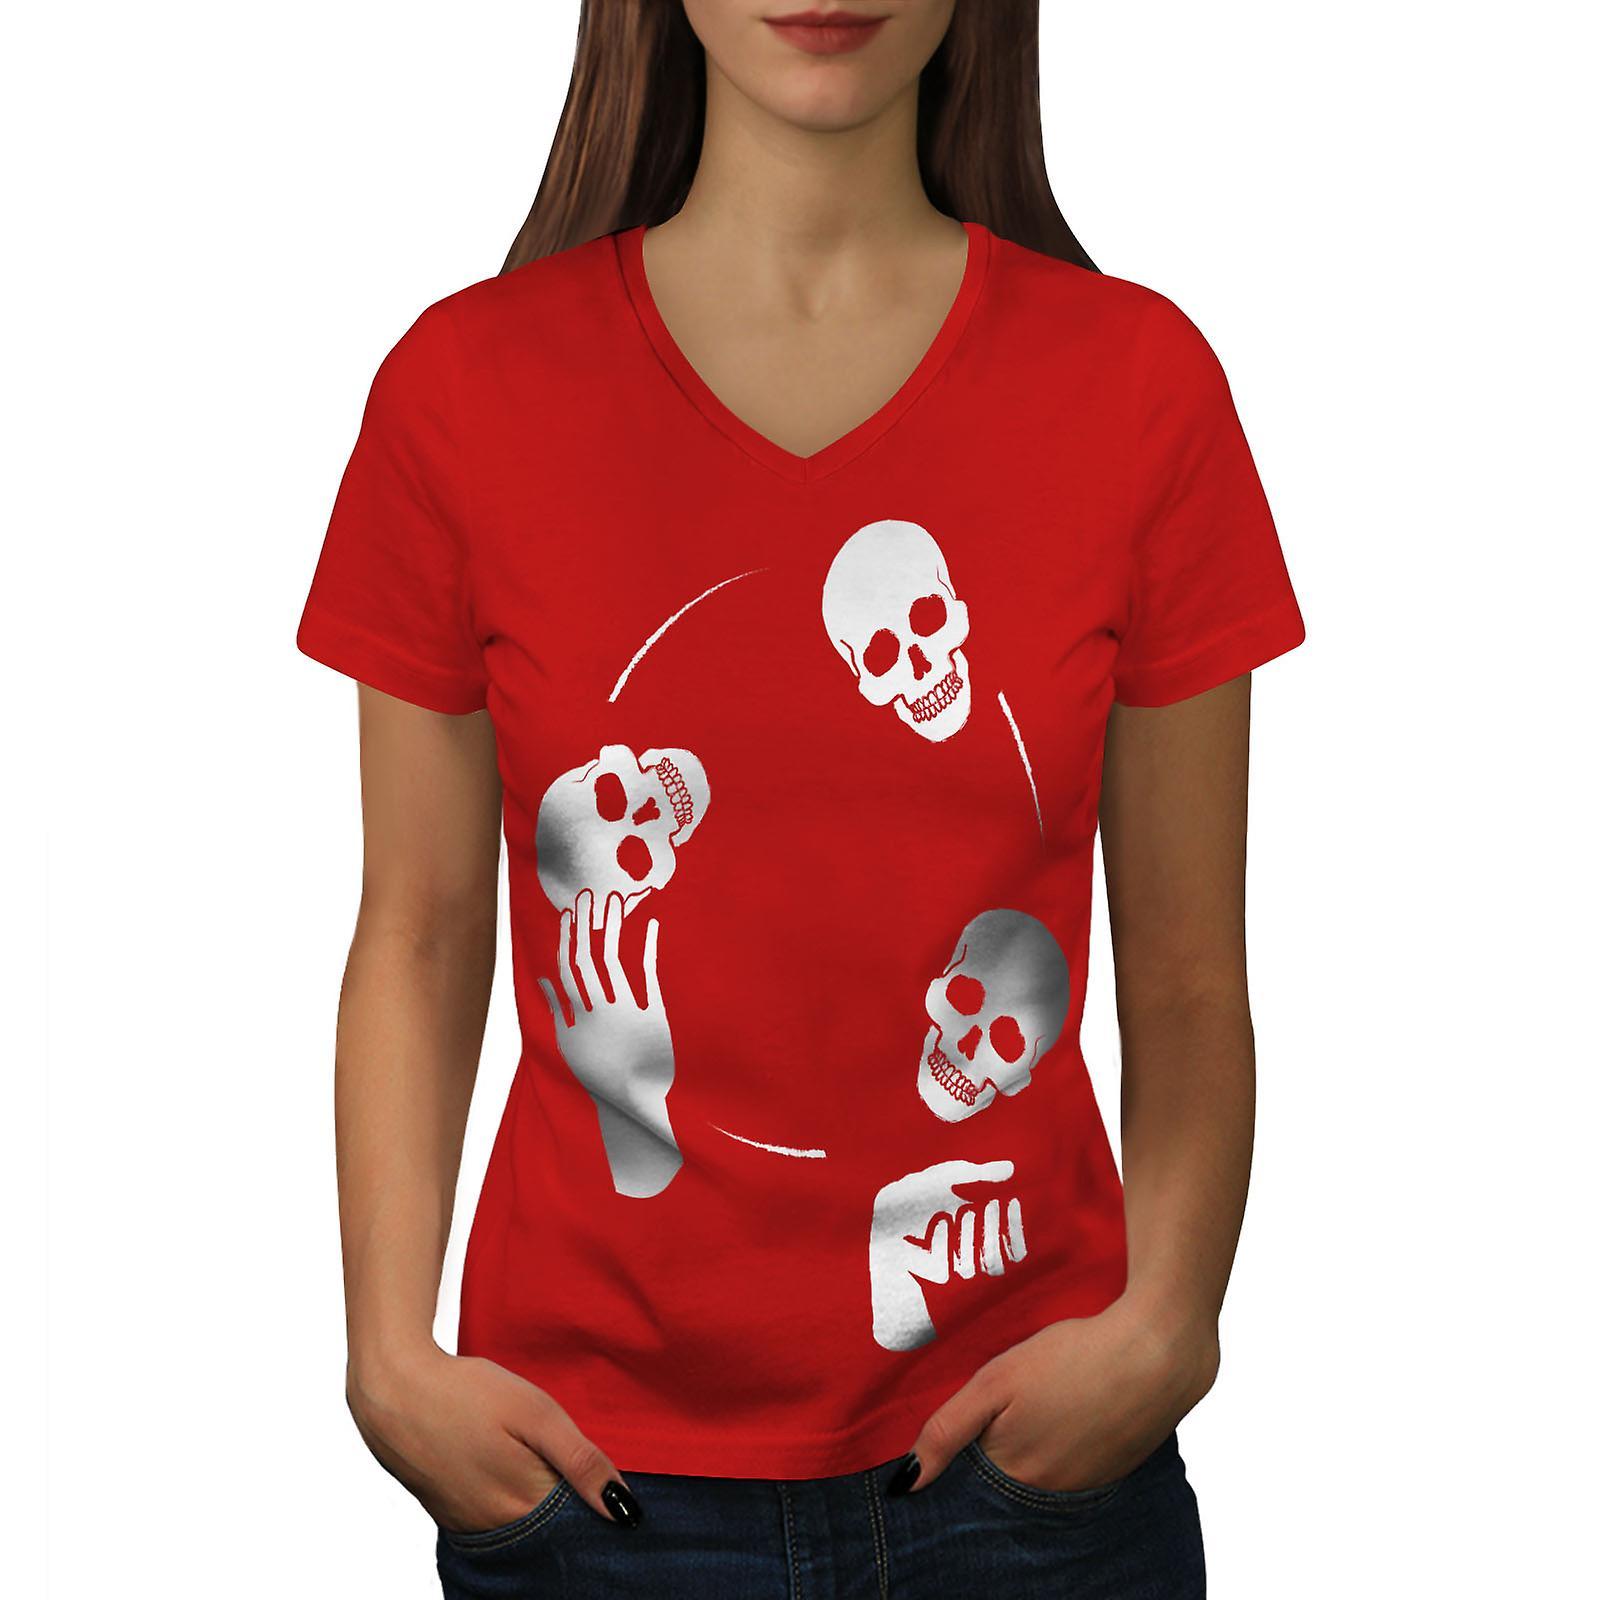 Jonglage Metal Rock femmes RedV-Neck T-shirt | Wellcoda